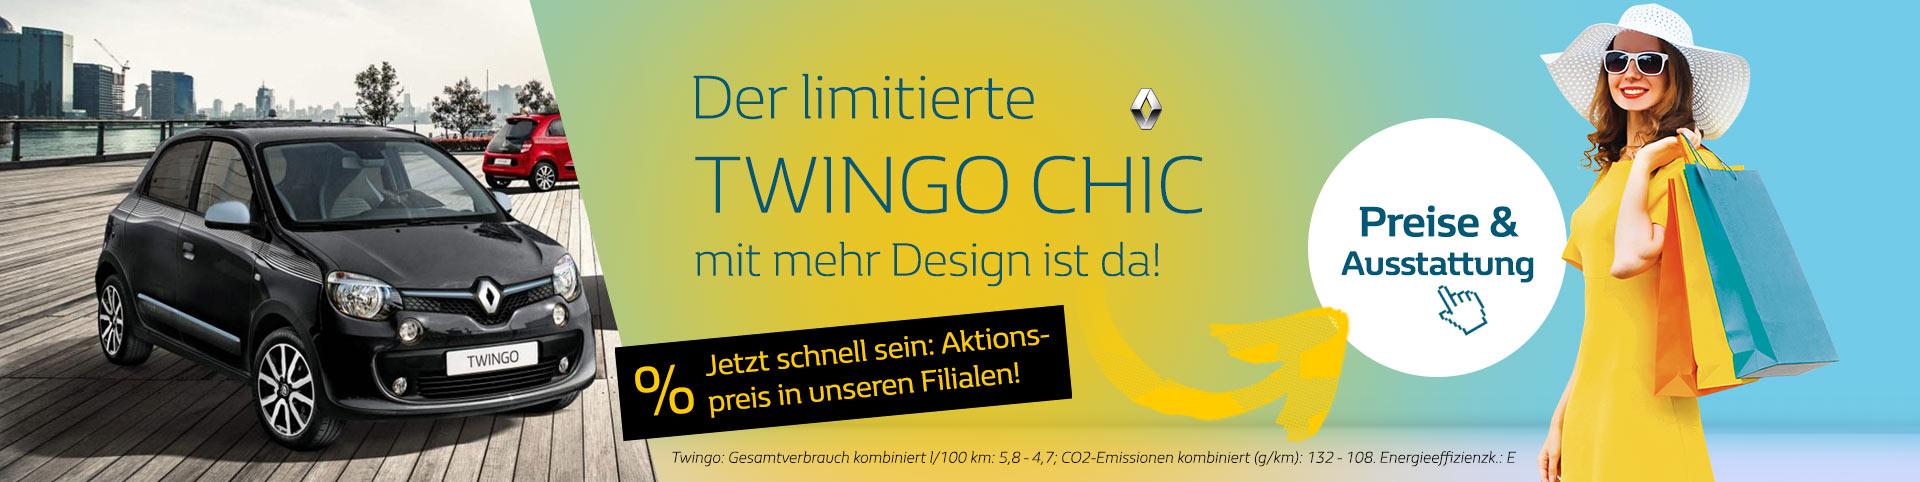 Renault Twingo Chic Angebot 2019